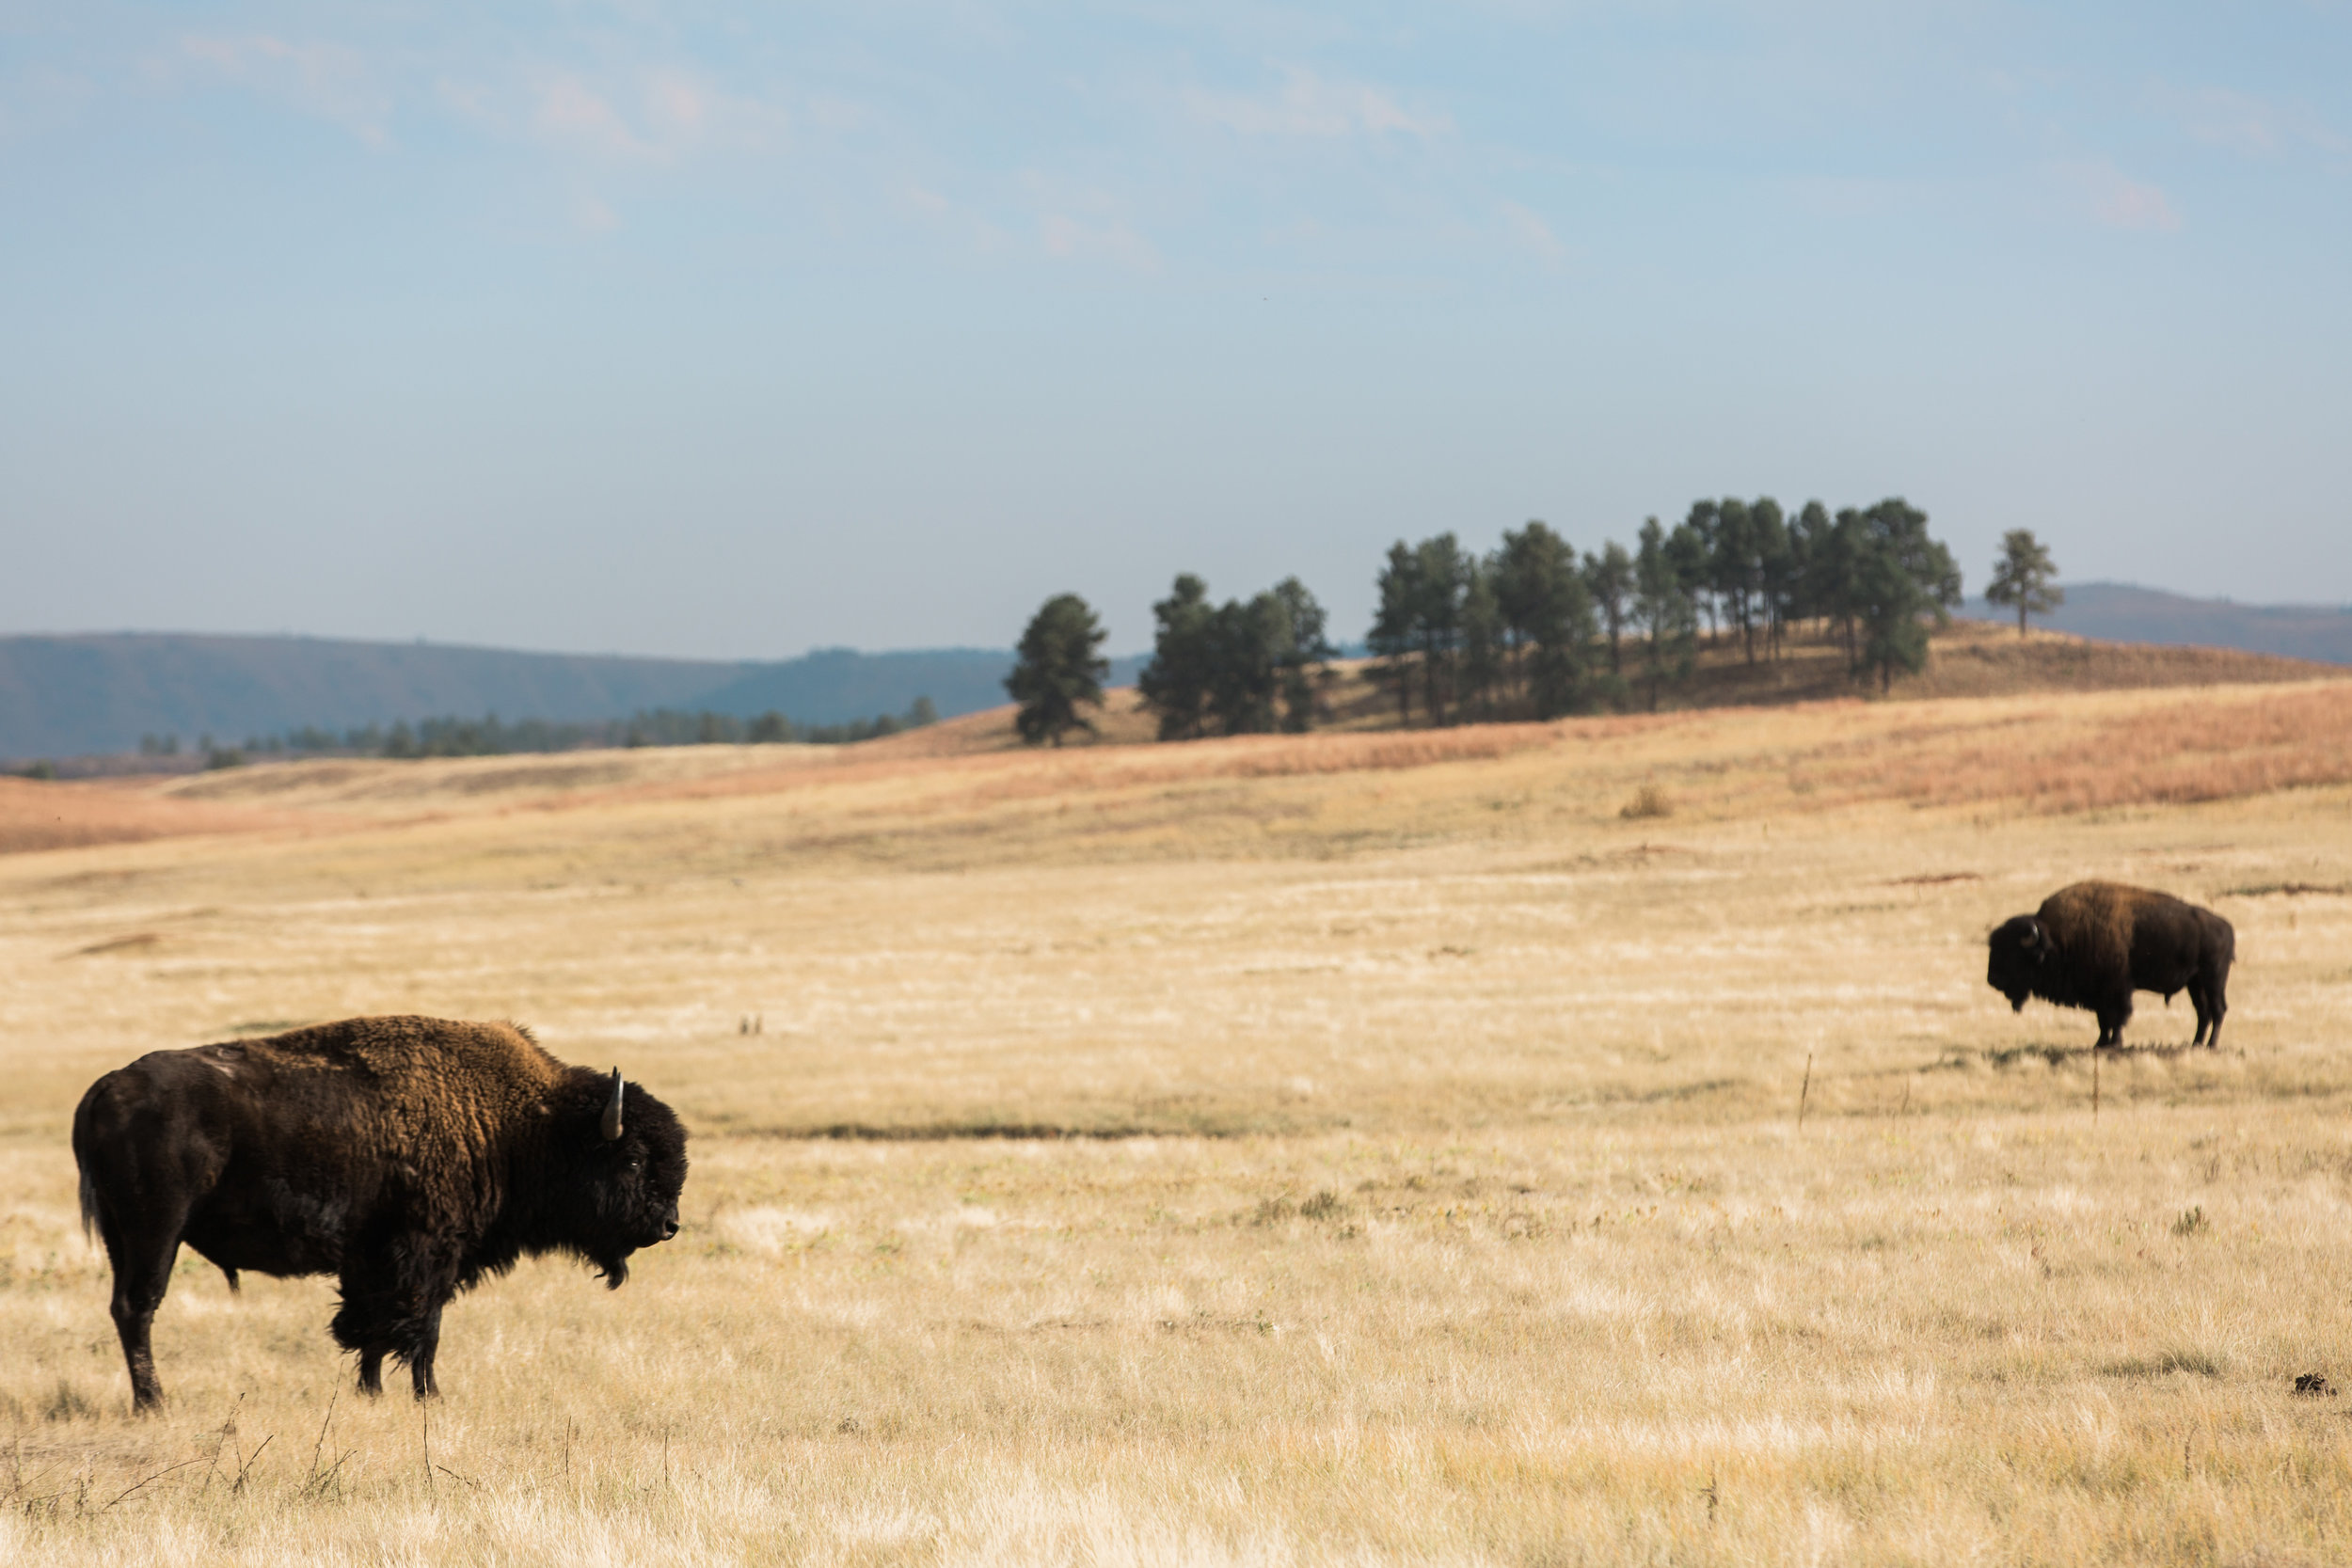 CindyGiovagnoli_outdoor_adventure_photography_Grand_Teton_Yellowstone_Glacier_National_Park_Montana_Wyoming_South_Dakota_Mount_Rushmore_Badlands-004.jpg